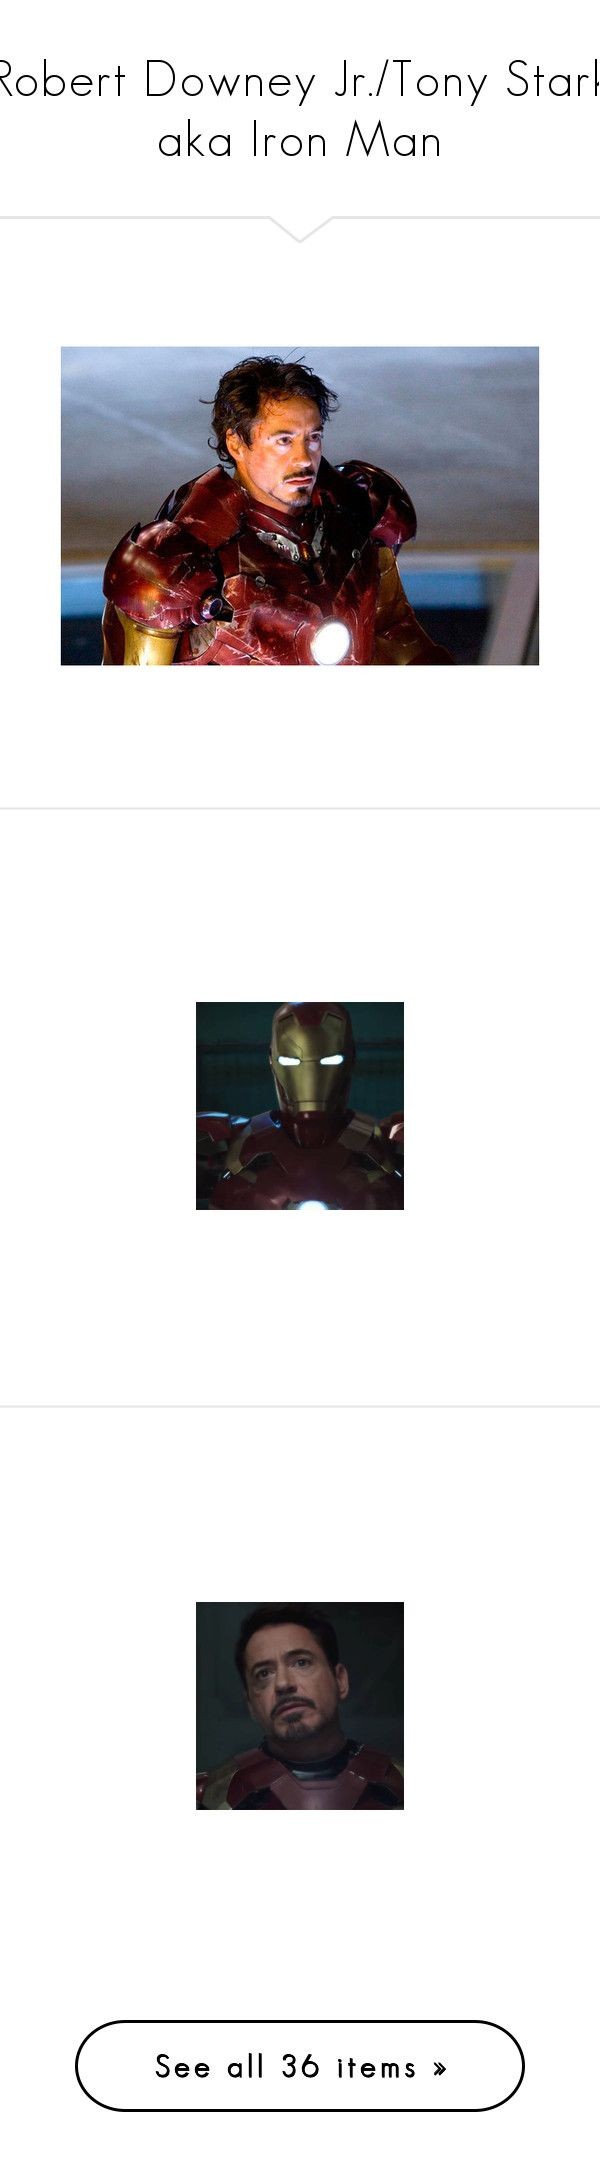 """Robert Downey Jr./Tony Stark aka Iron Man"" by nerdbucket ❤ liked on Polyvore featuring marvel, avengers, images, iron man, robert downey jr, superheroes, tony stark, pepper potts, people and the avengers"